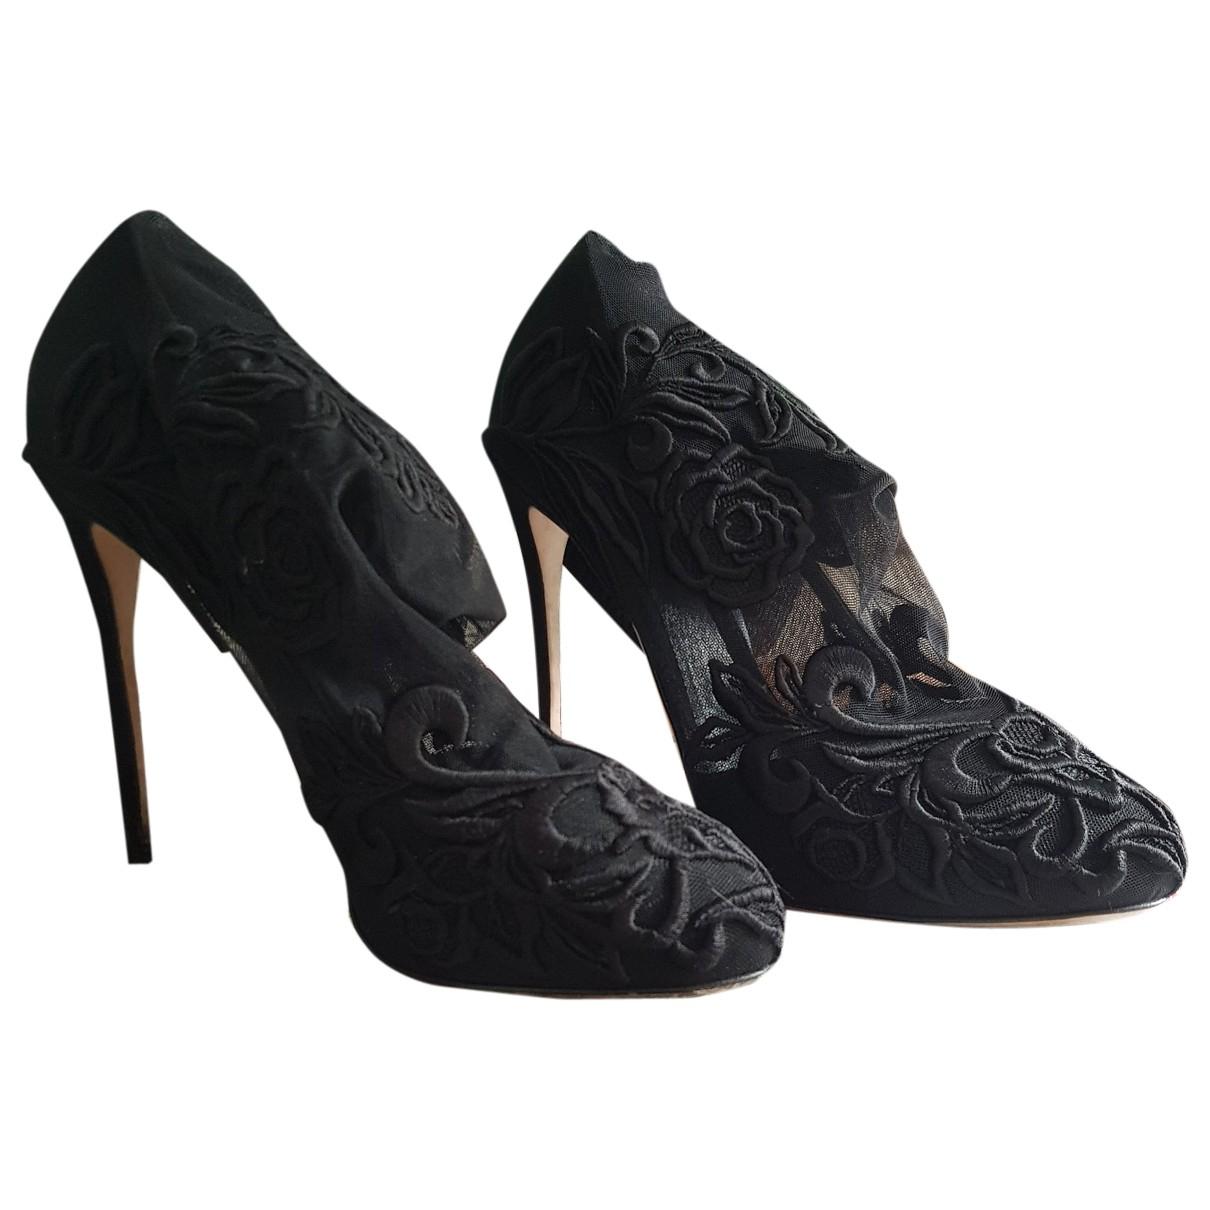 Botines de Lona Dolce & Gabbana